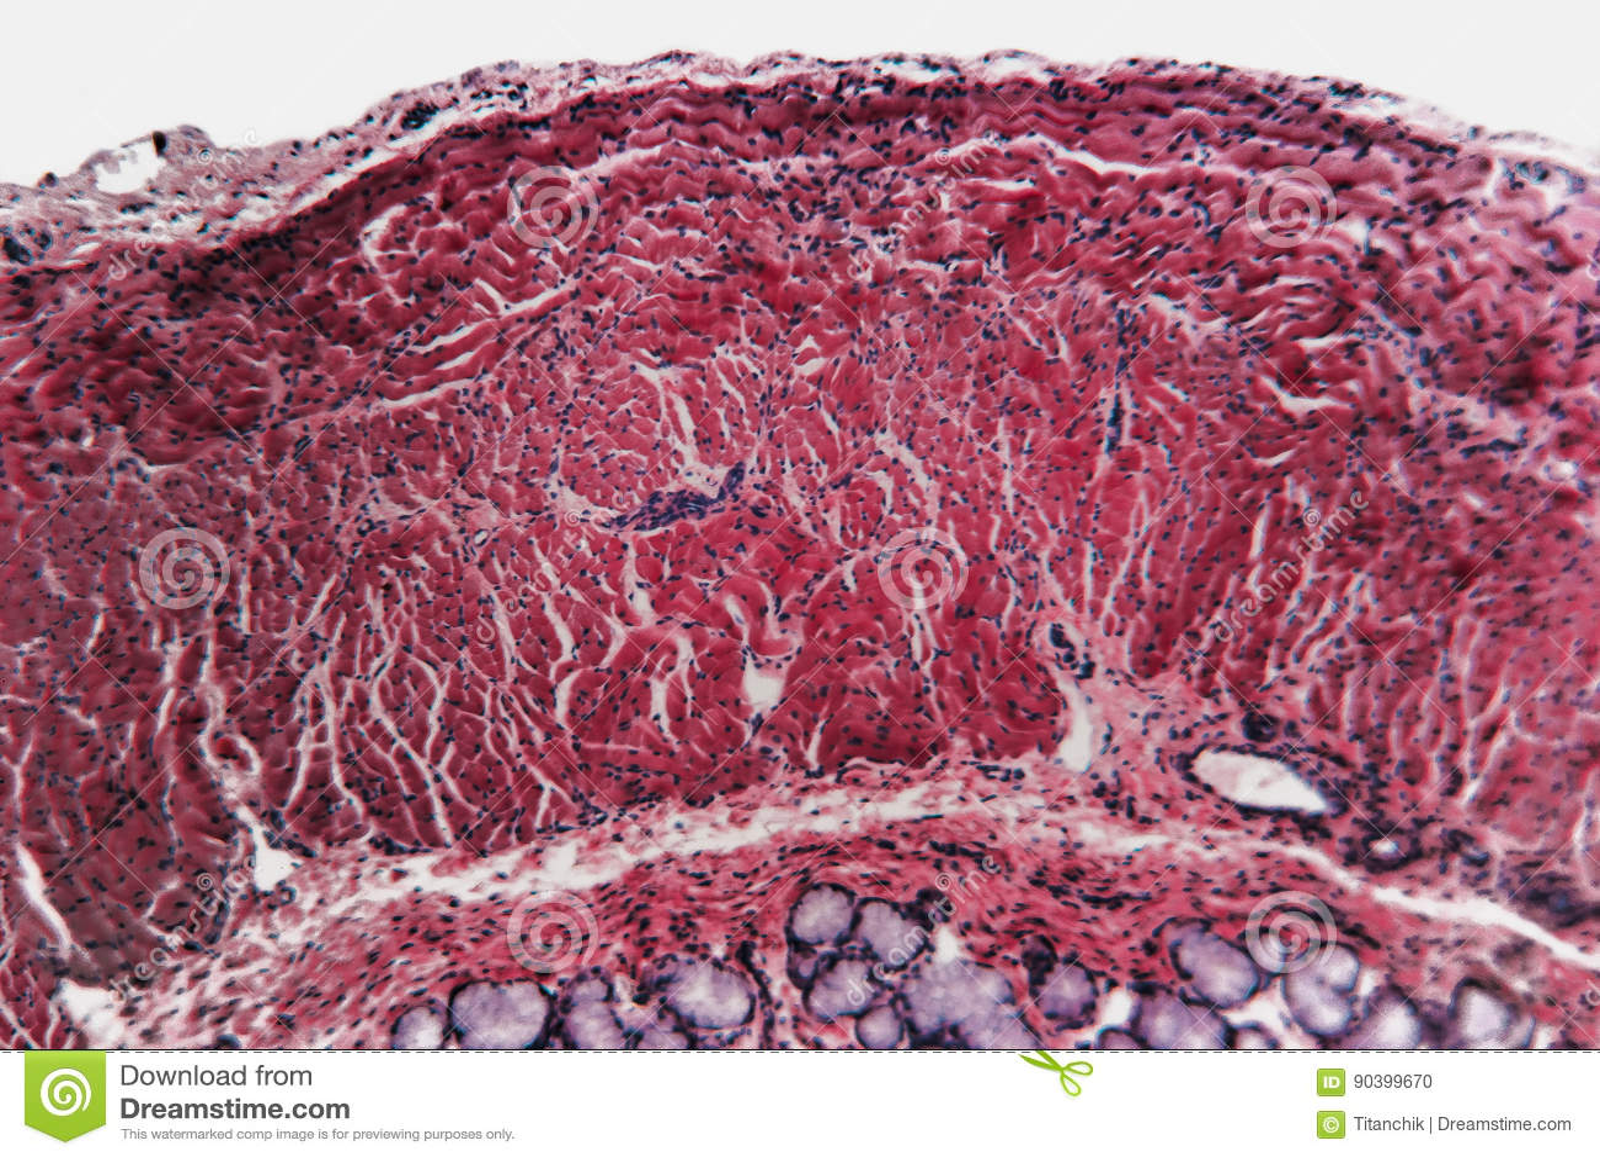 Microbiology cell- esophagus dog